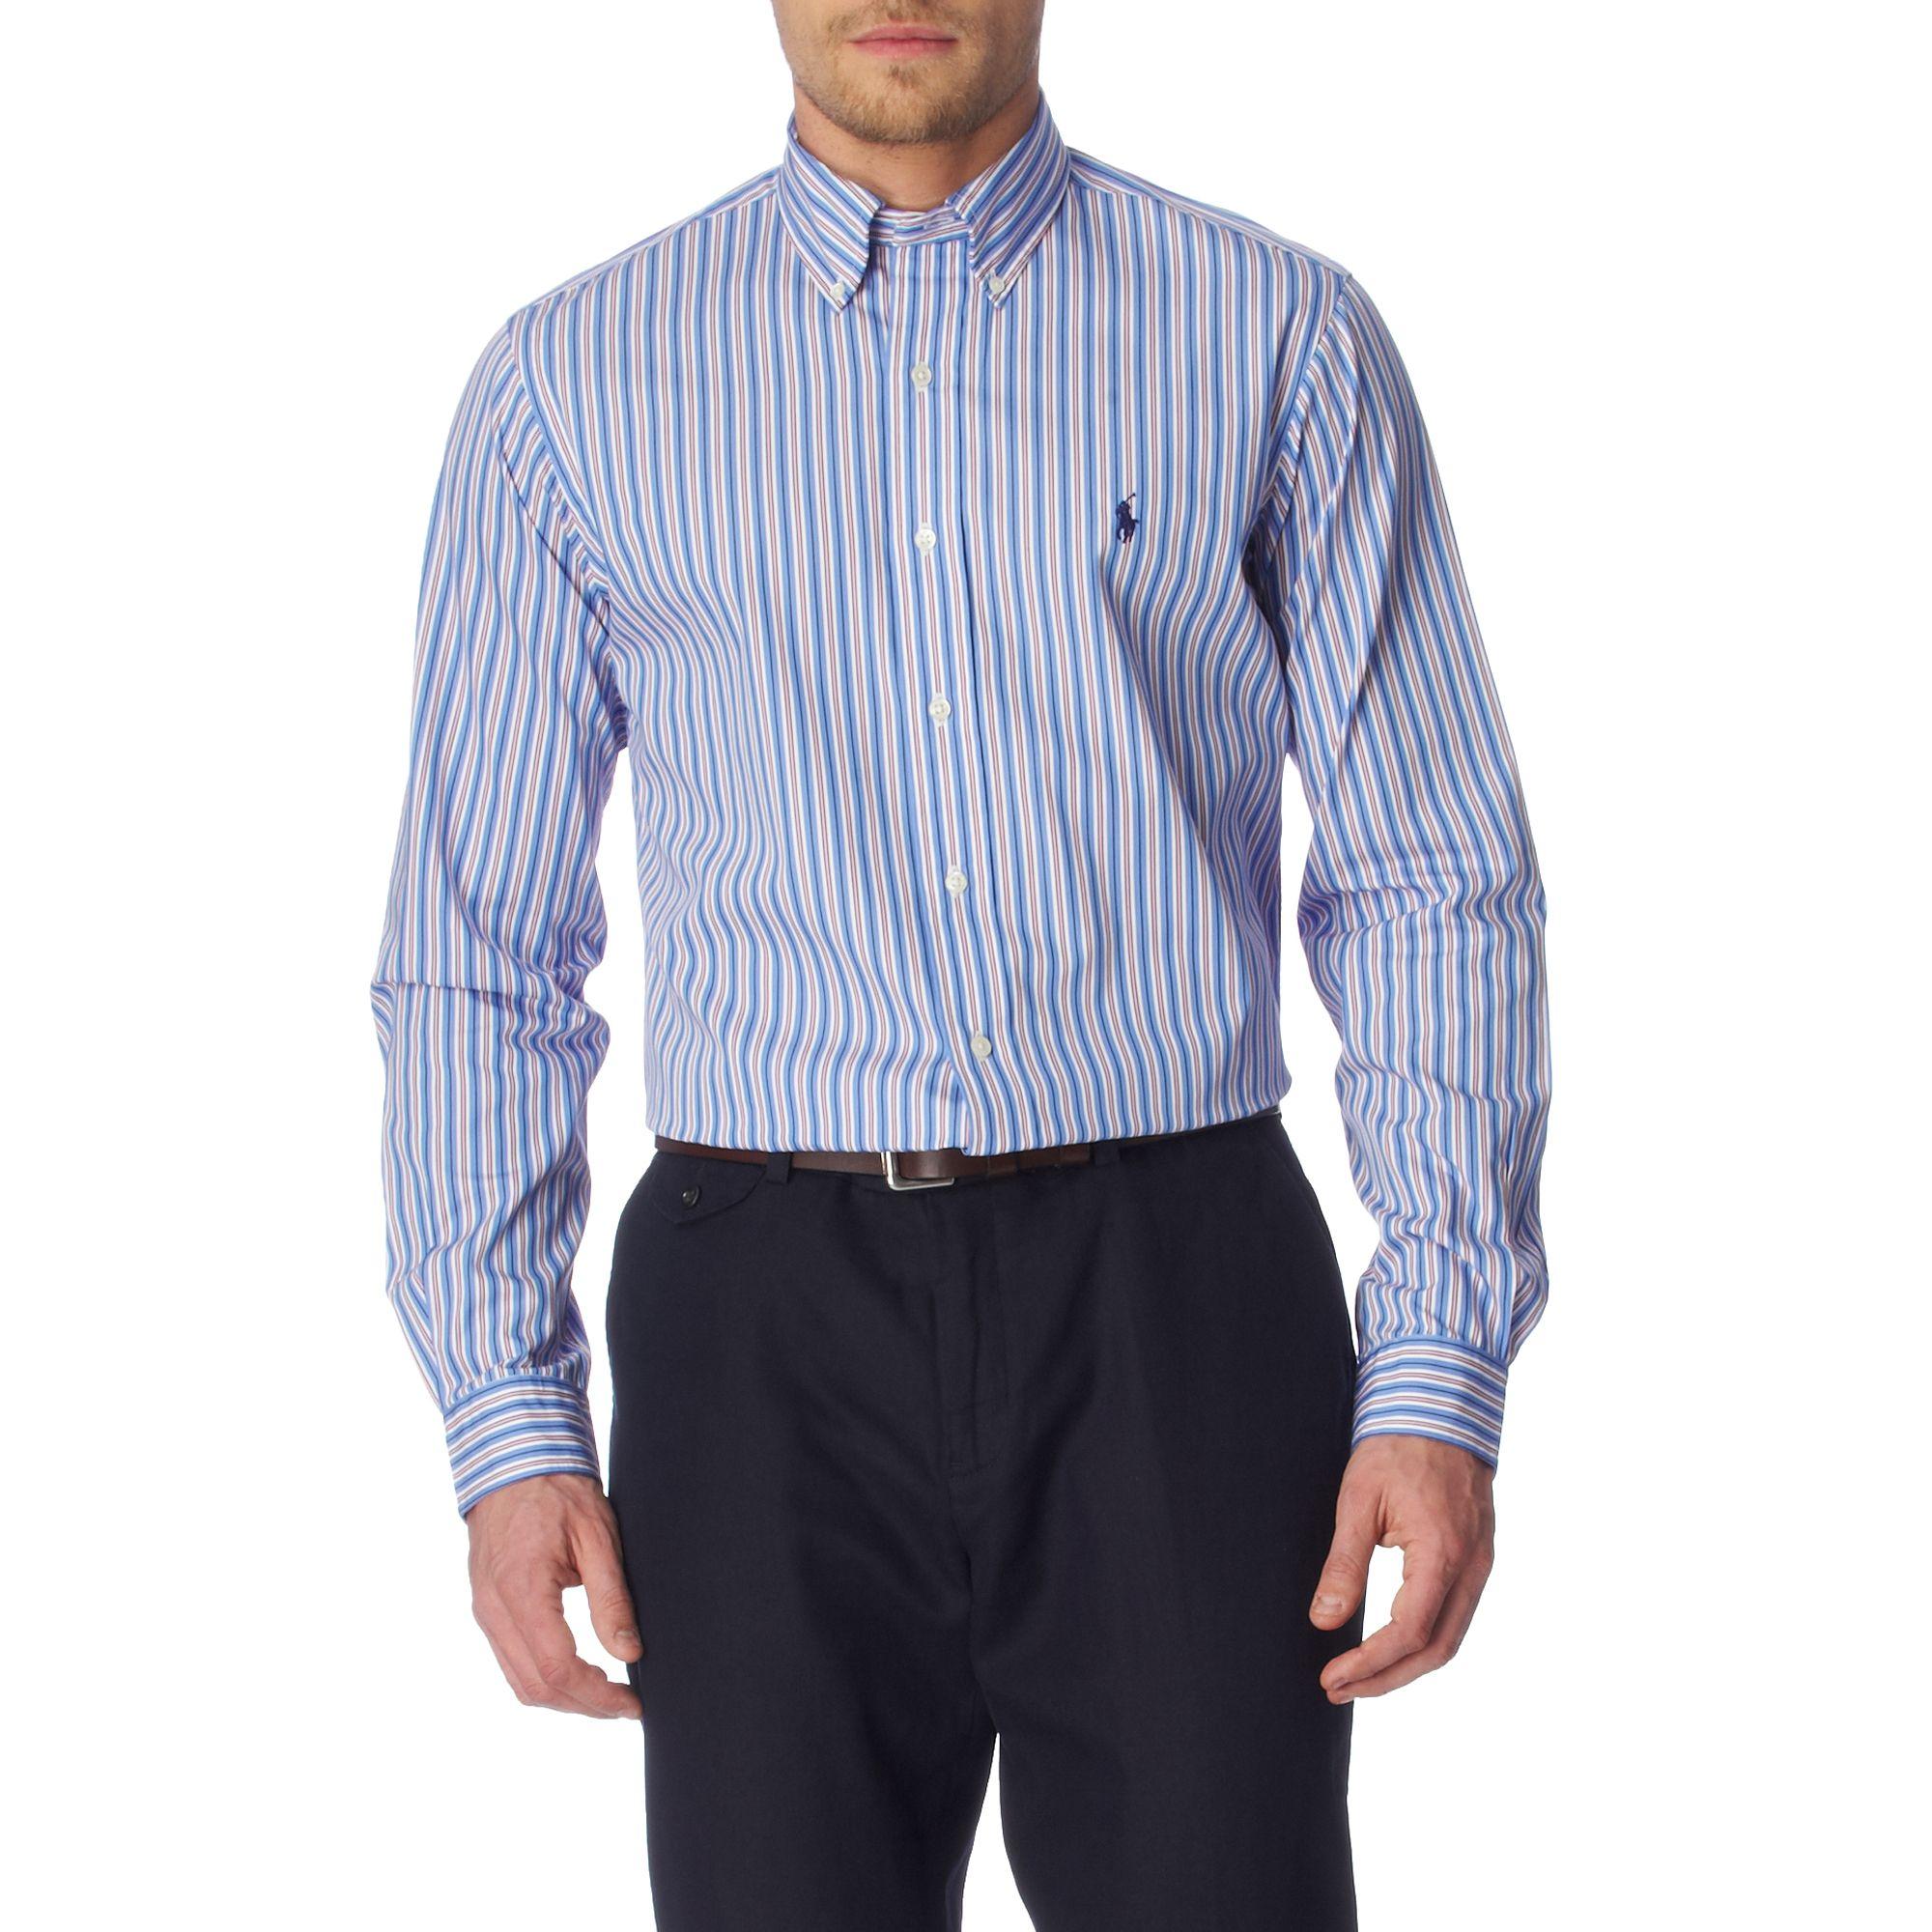 Ralph lauren striped custom fit single cuff shirt in blue for Single cuff dress shirt